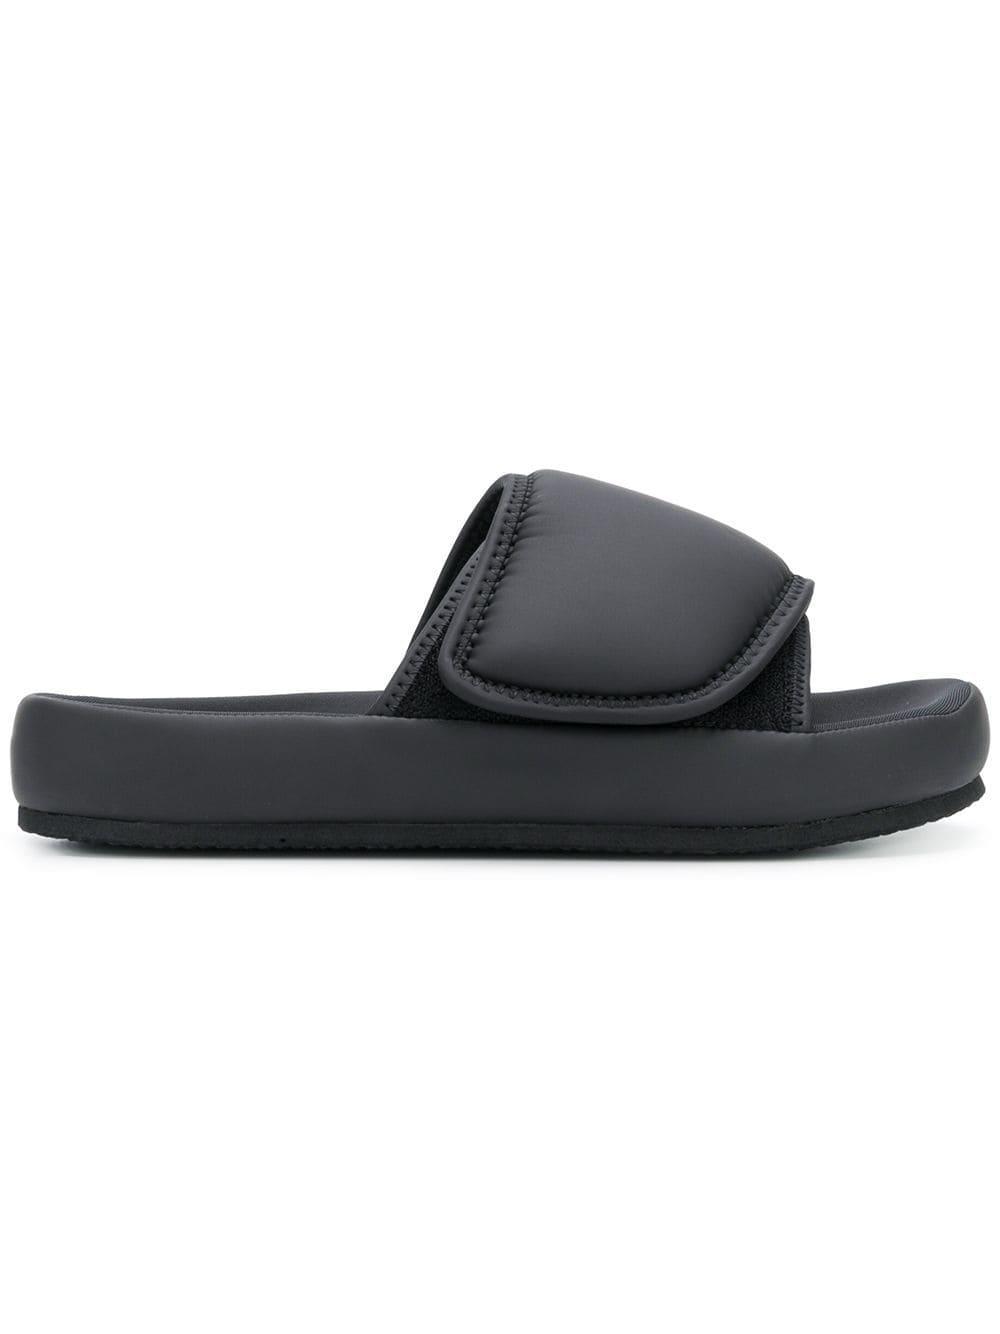 Yeezy Neoprene Bulky Sandals in Black